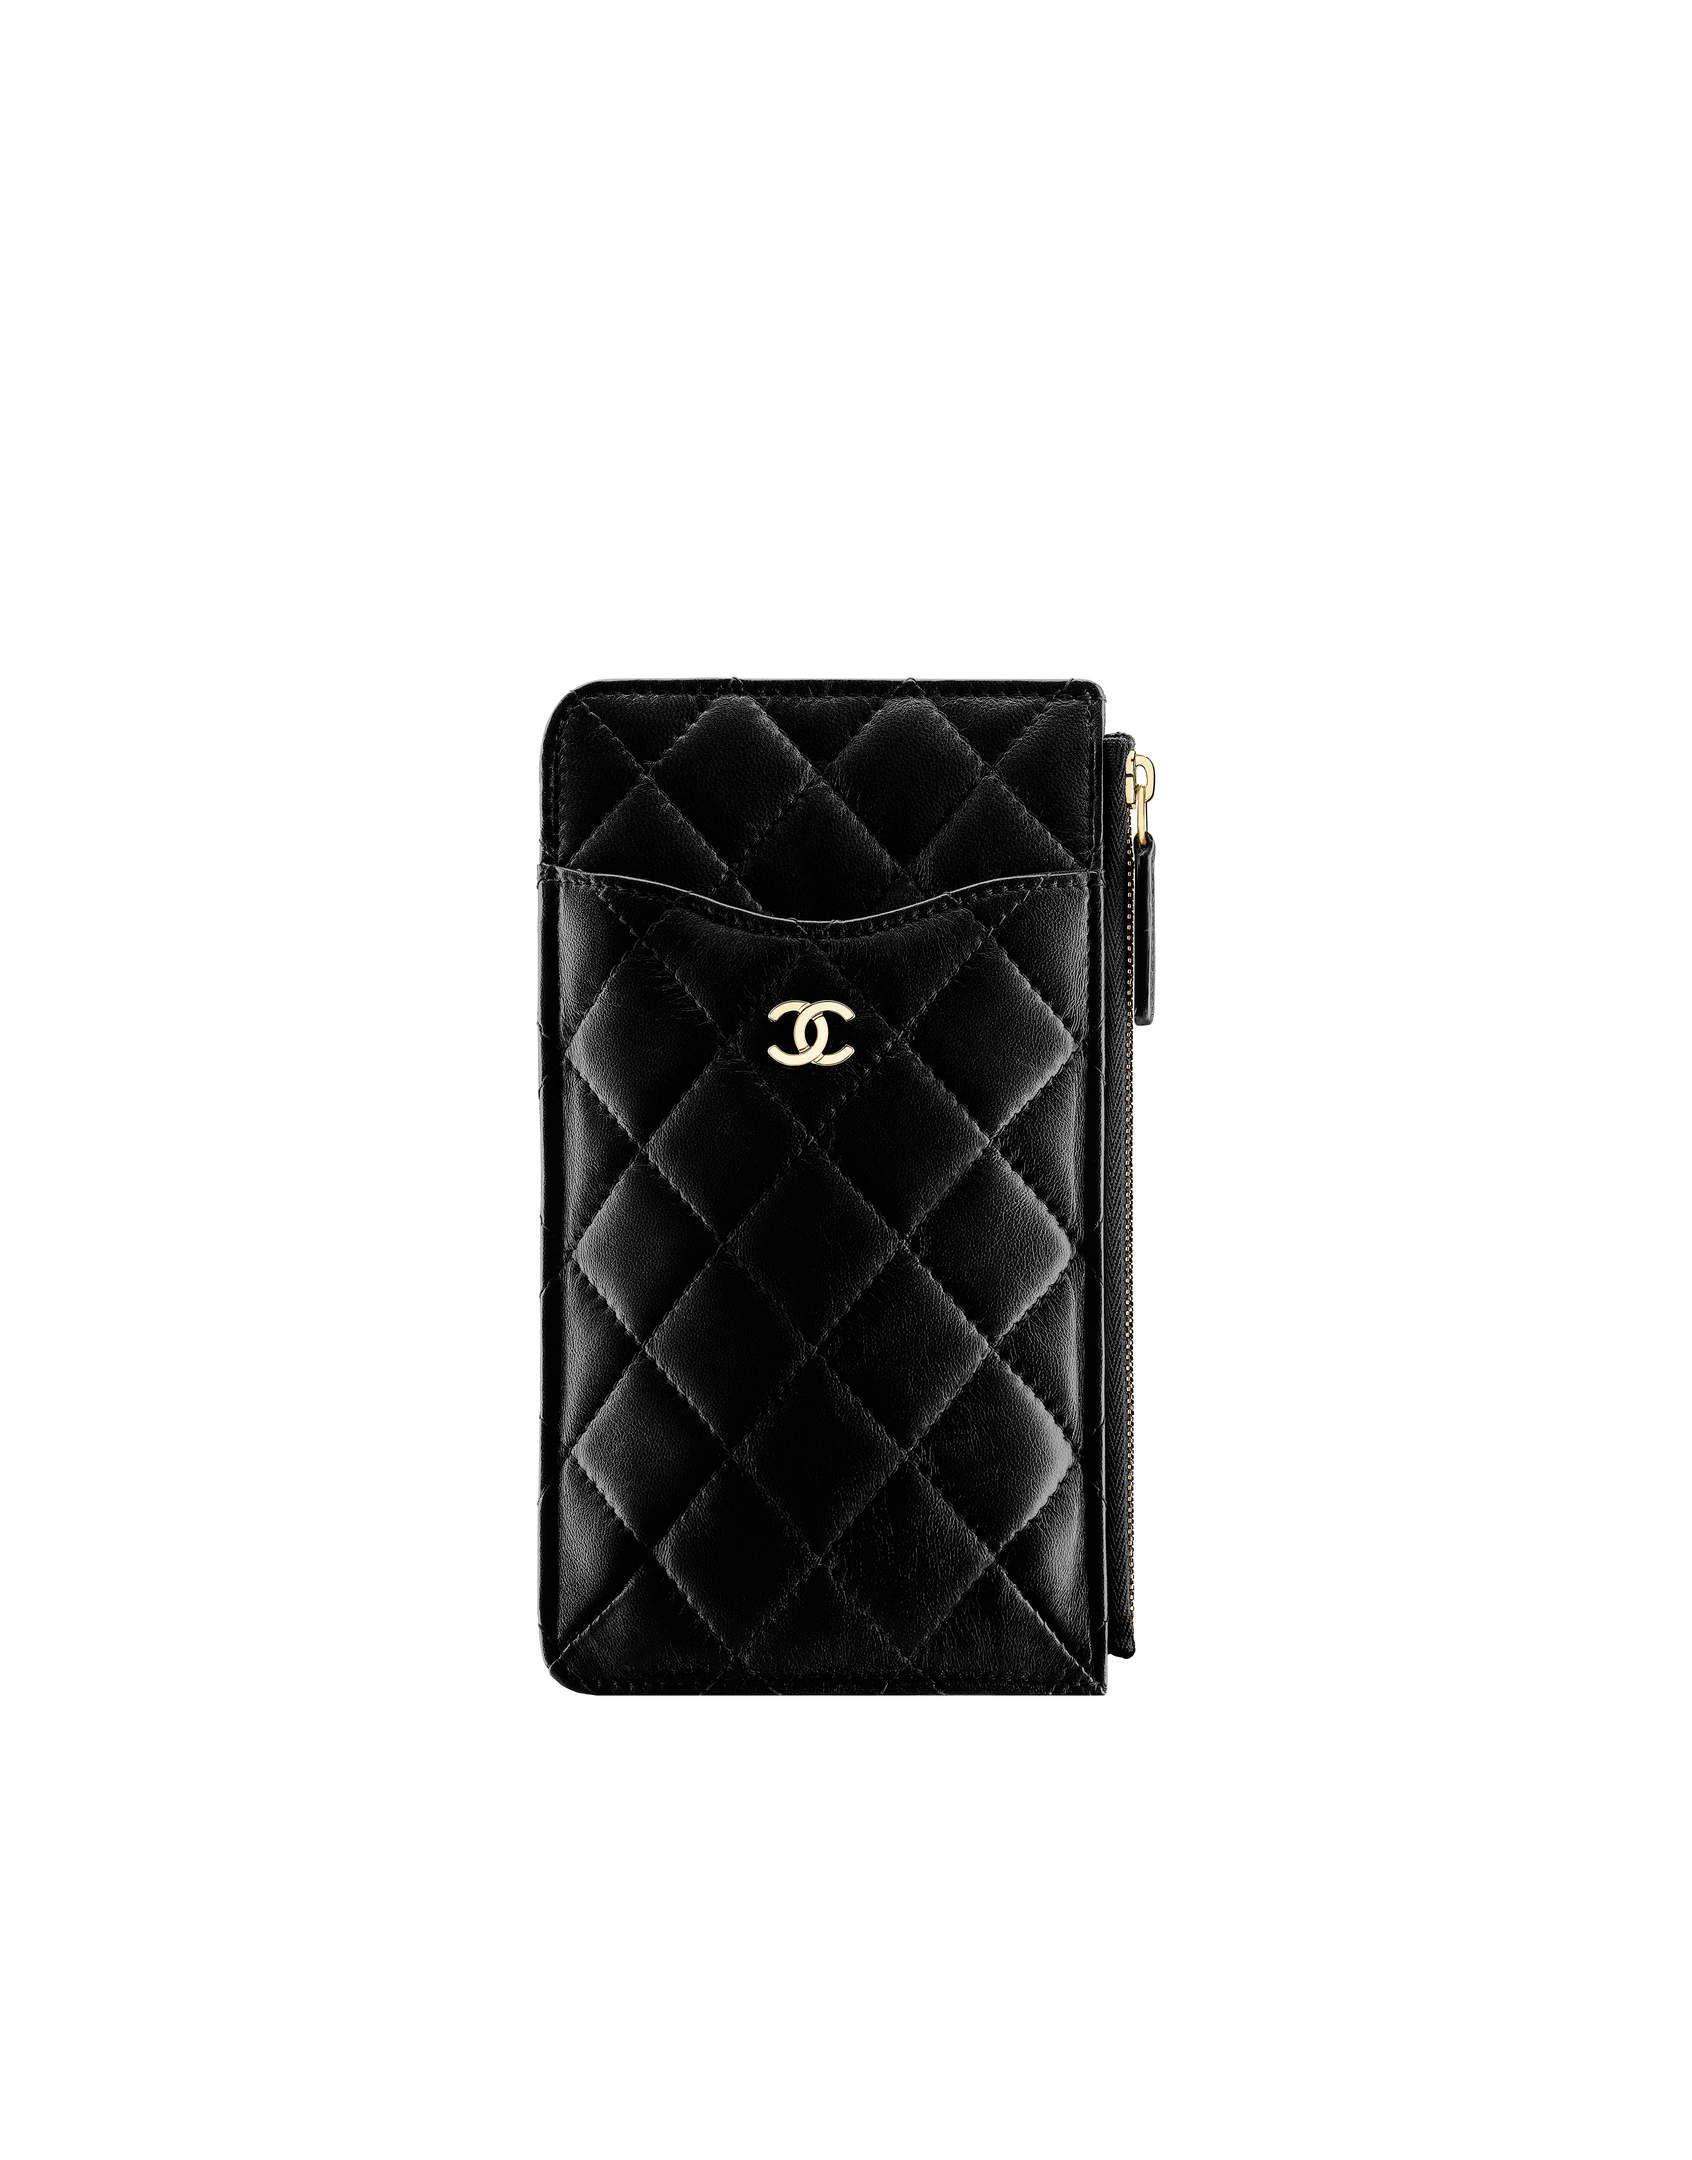 15c6b2f3218b CHANEL Flat Wallet Pouch - Cruise 17/18 | chanel ♥ chanel | Chanel ...